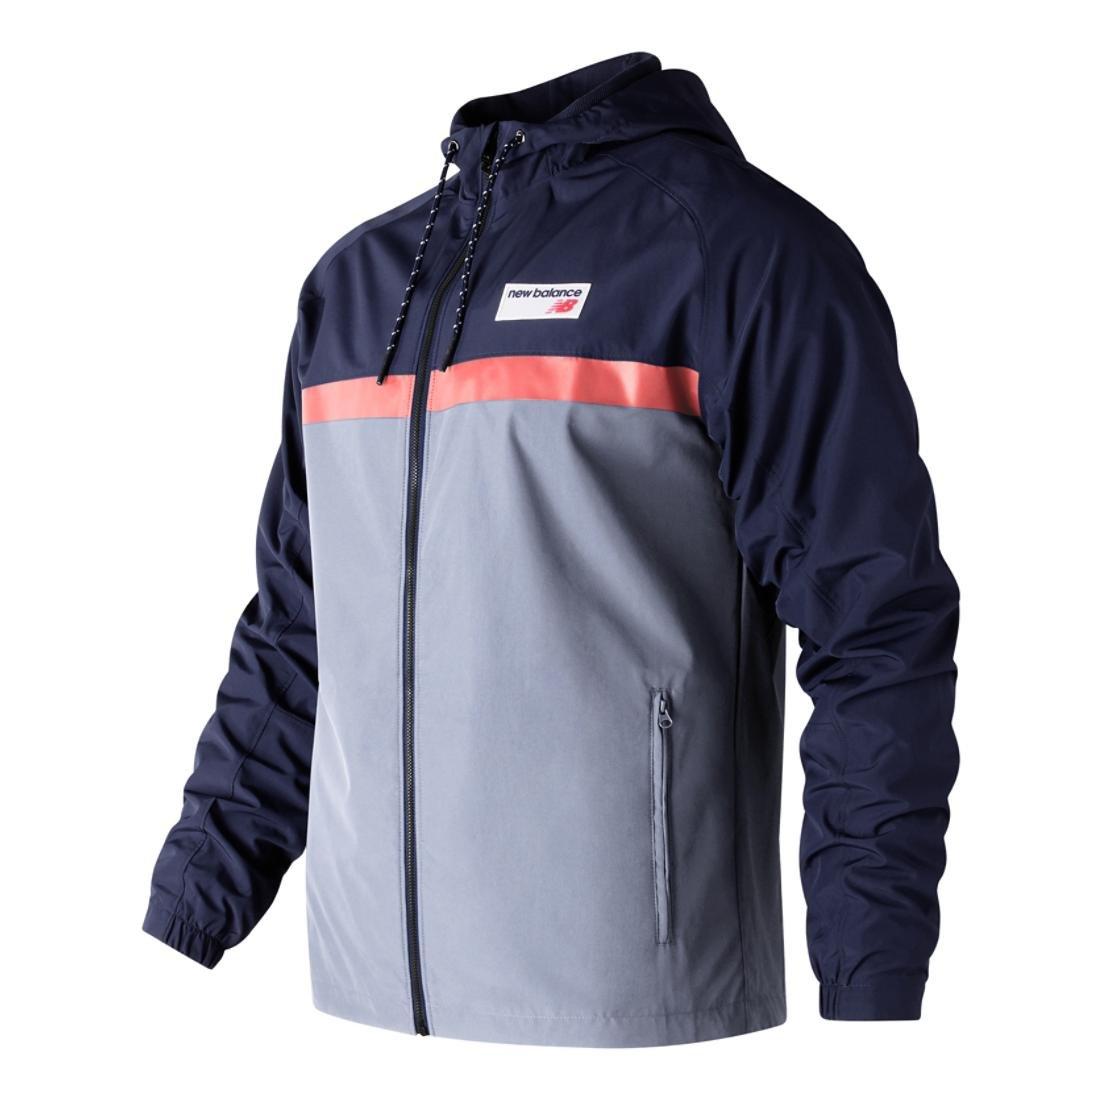 b11b3970d9f03 Amazon.com: New Balance Men's Athletics 78 Pocketed Reflective Jacket:  Clothing